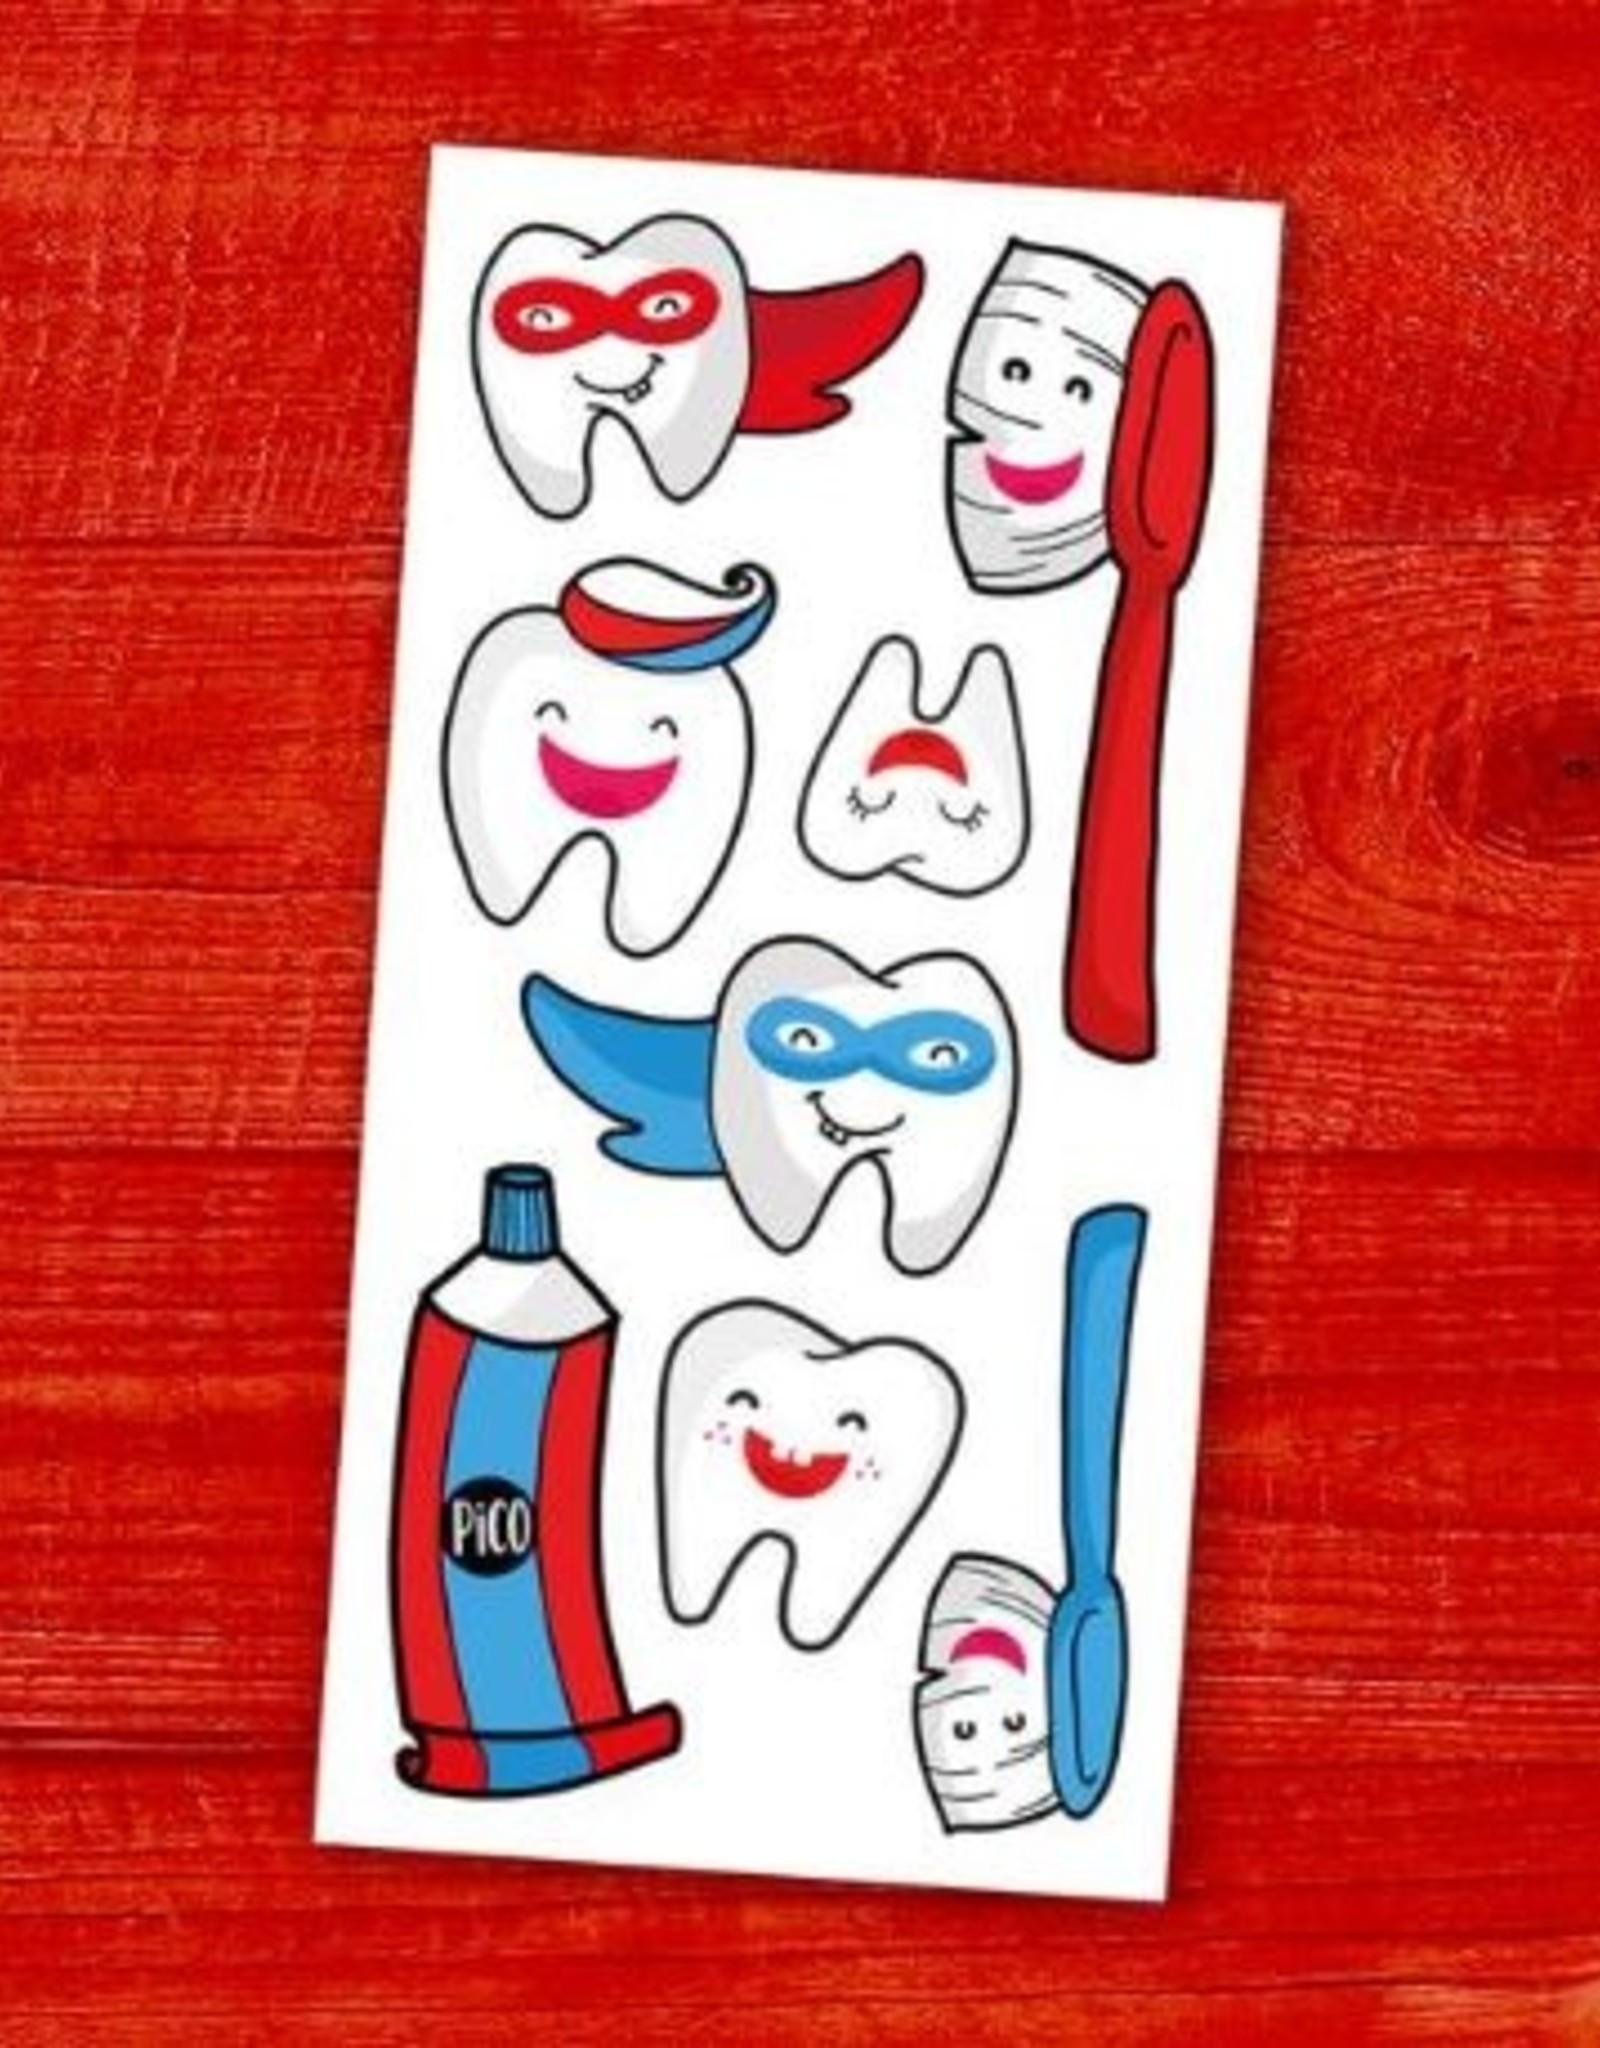 Pico Tatouage Tatouage temporaire Brosse tes dents